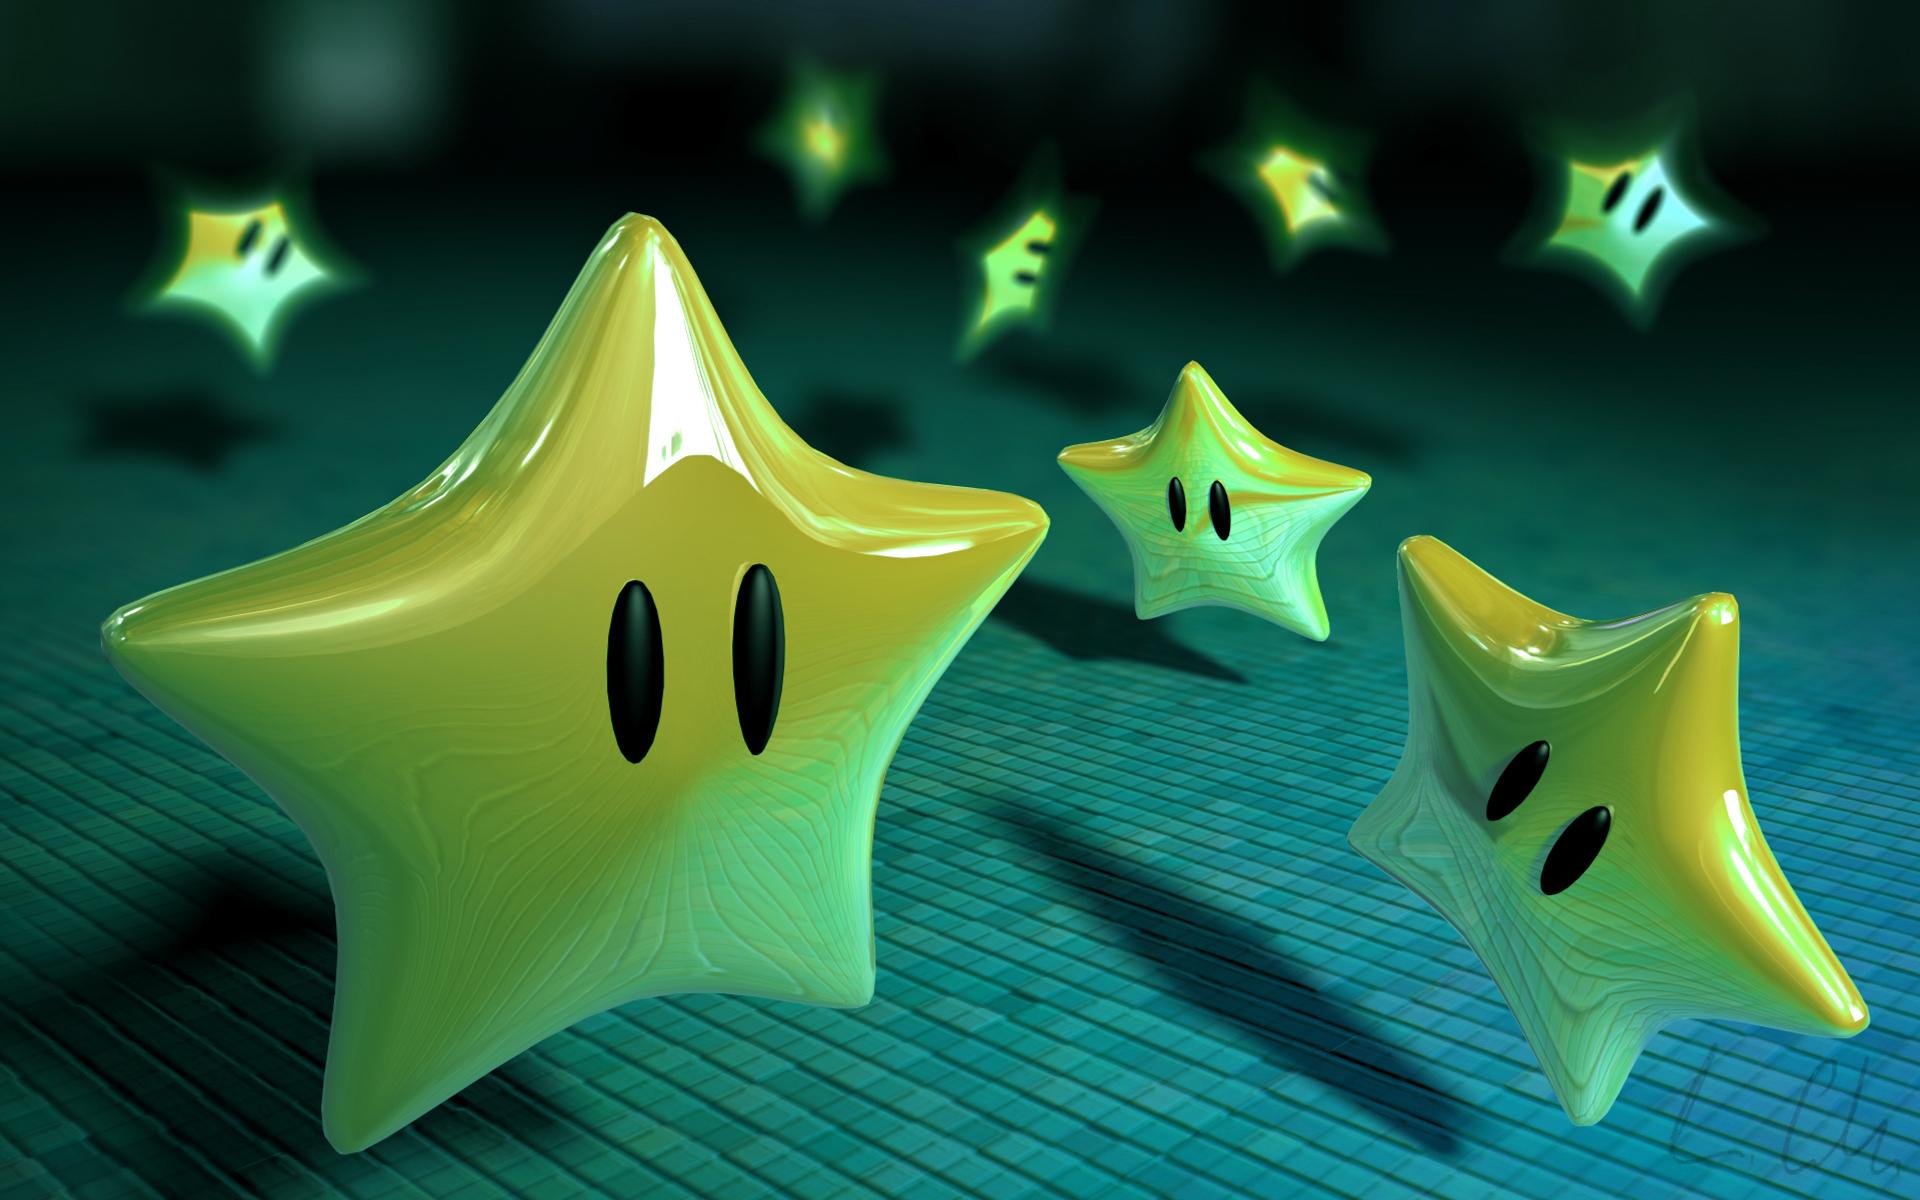 Google themes - Google Themes 3d Mario Stars Google Wallpapers 3d Mario Stars Google